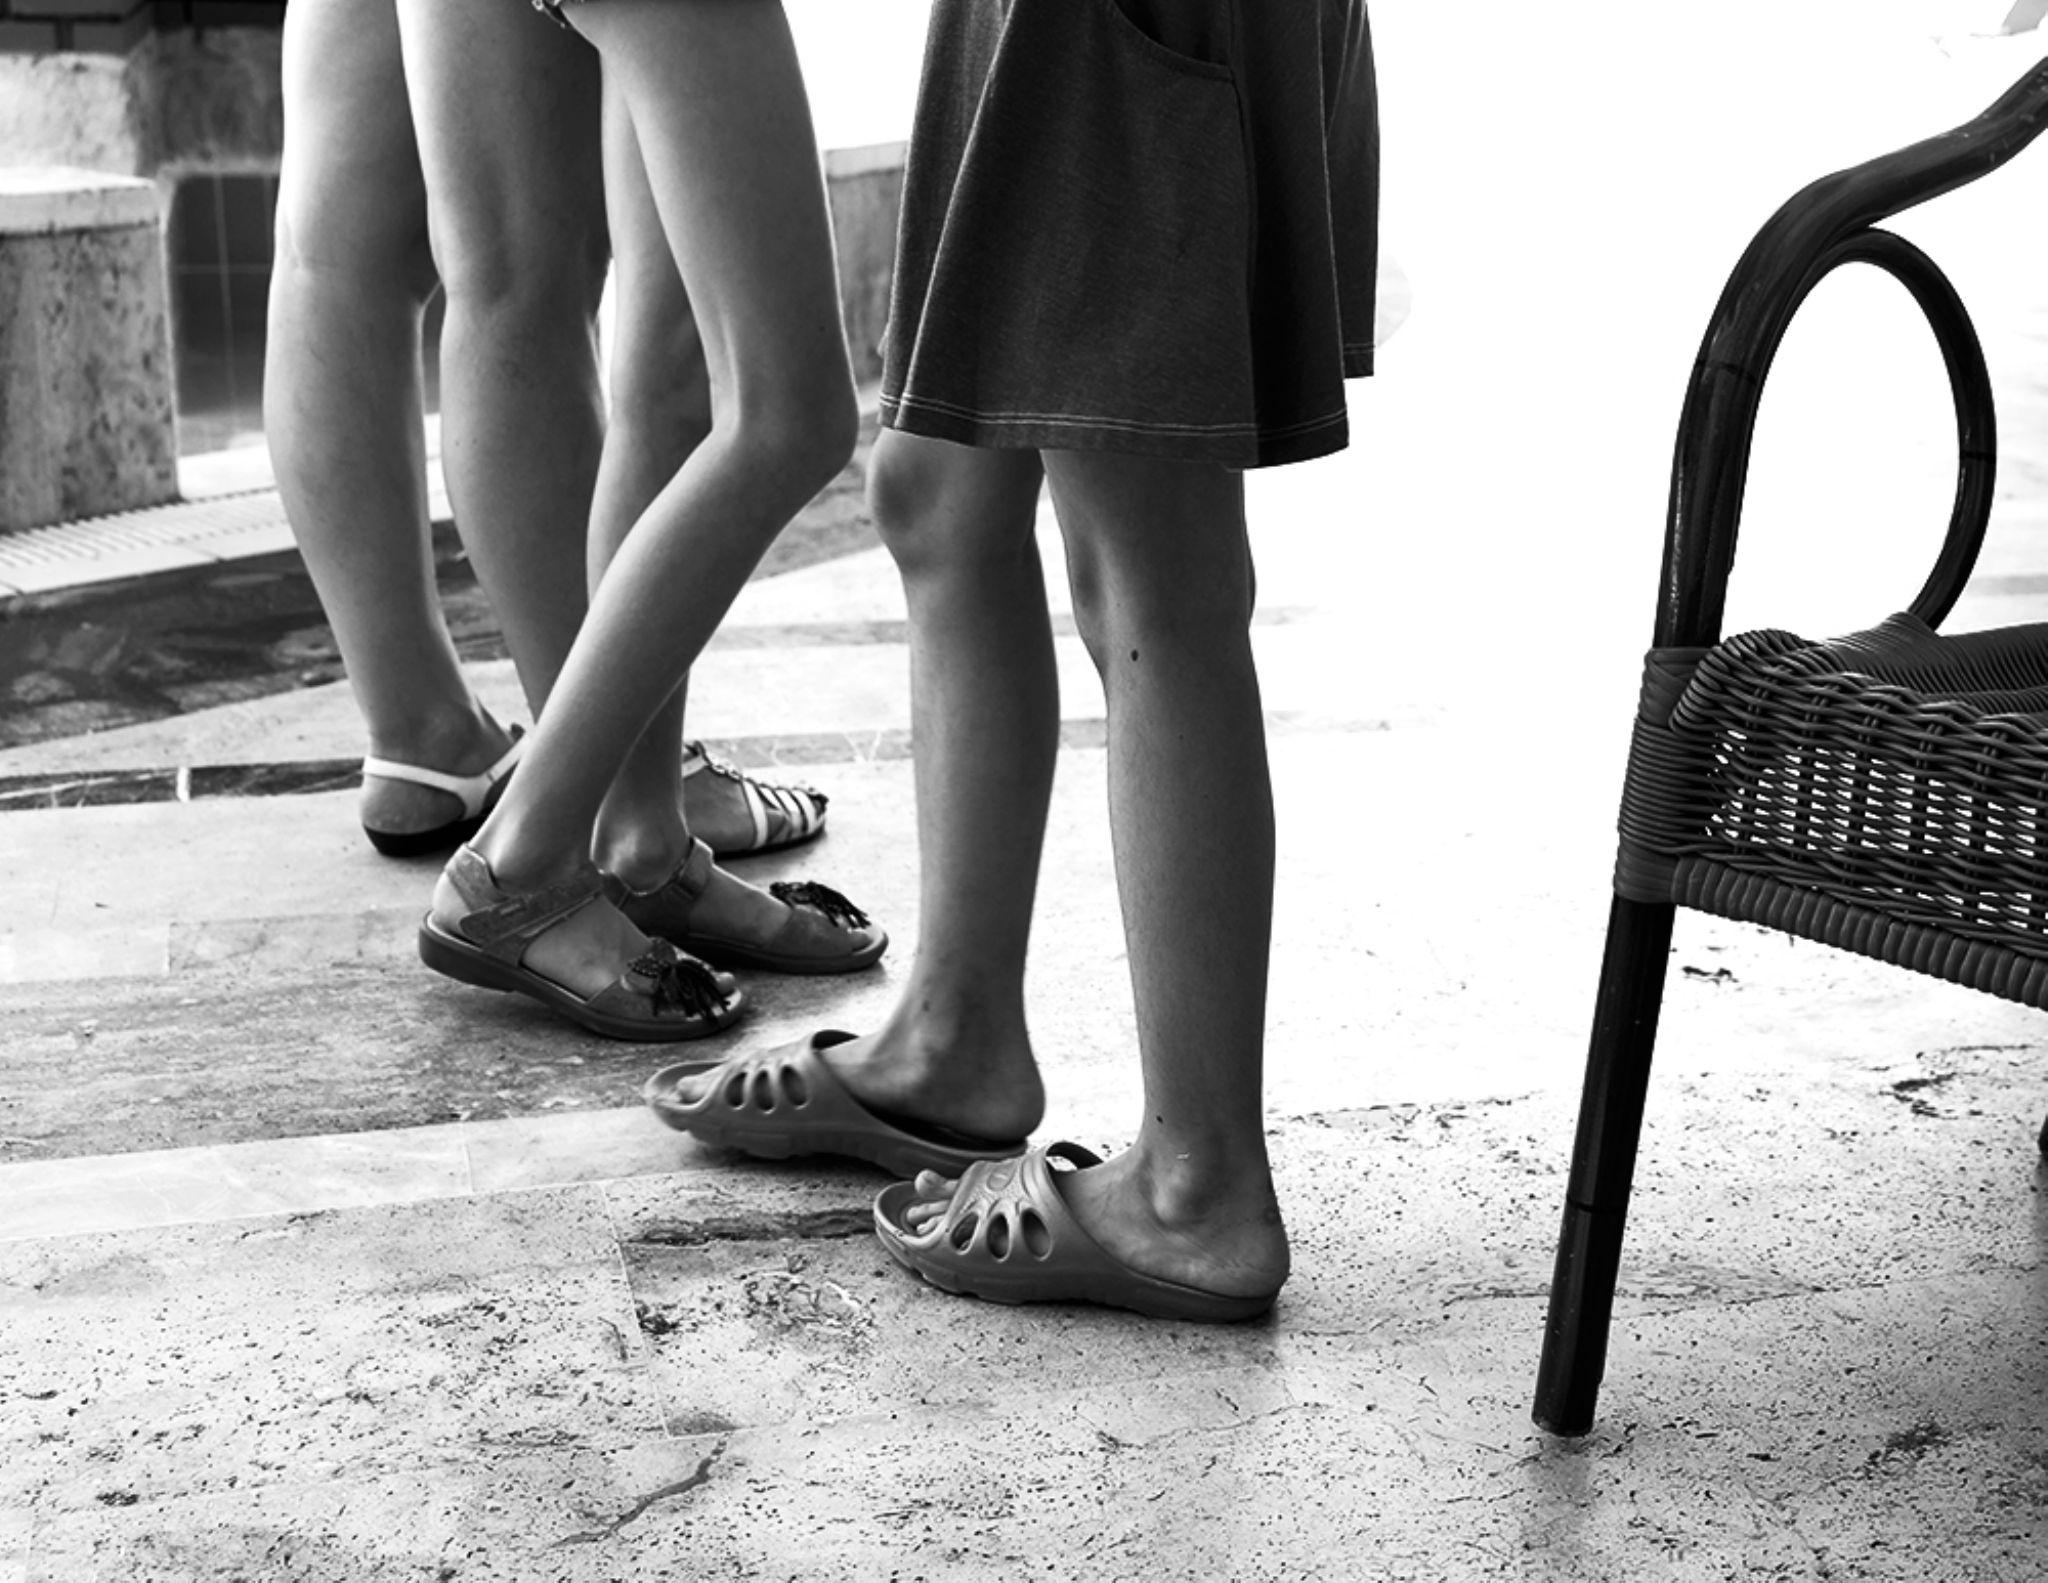 Standing affection by Ziya YILDIRIM